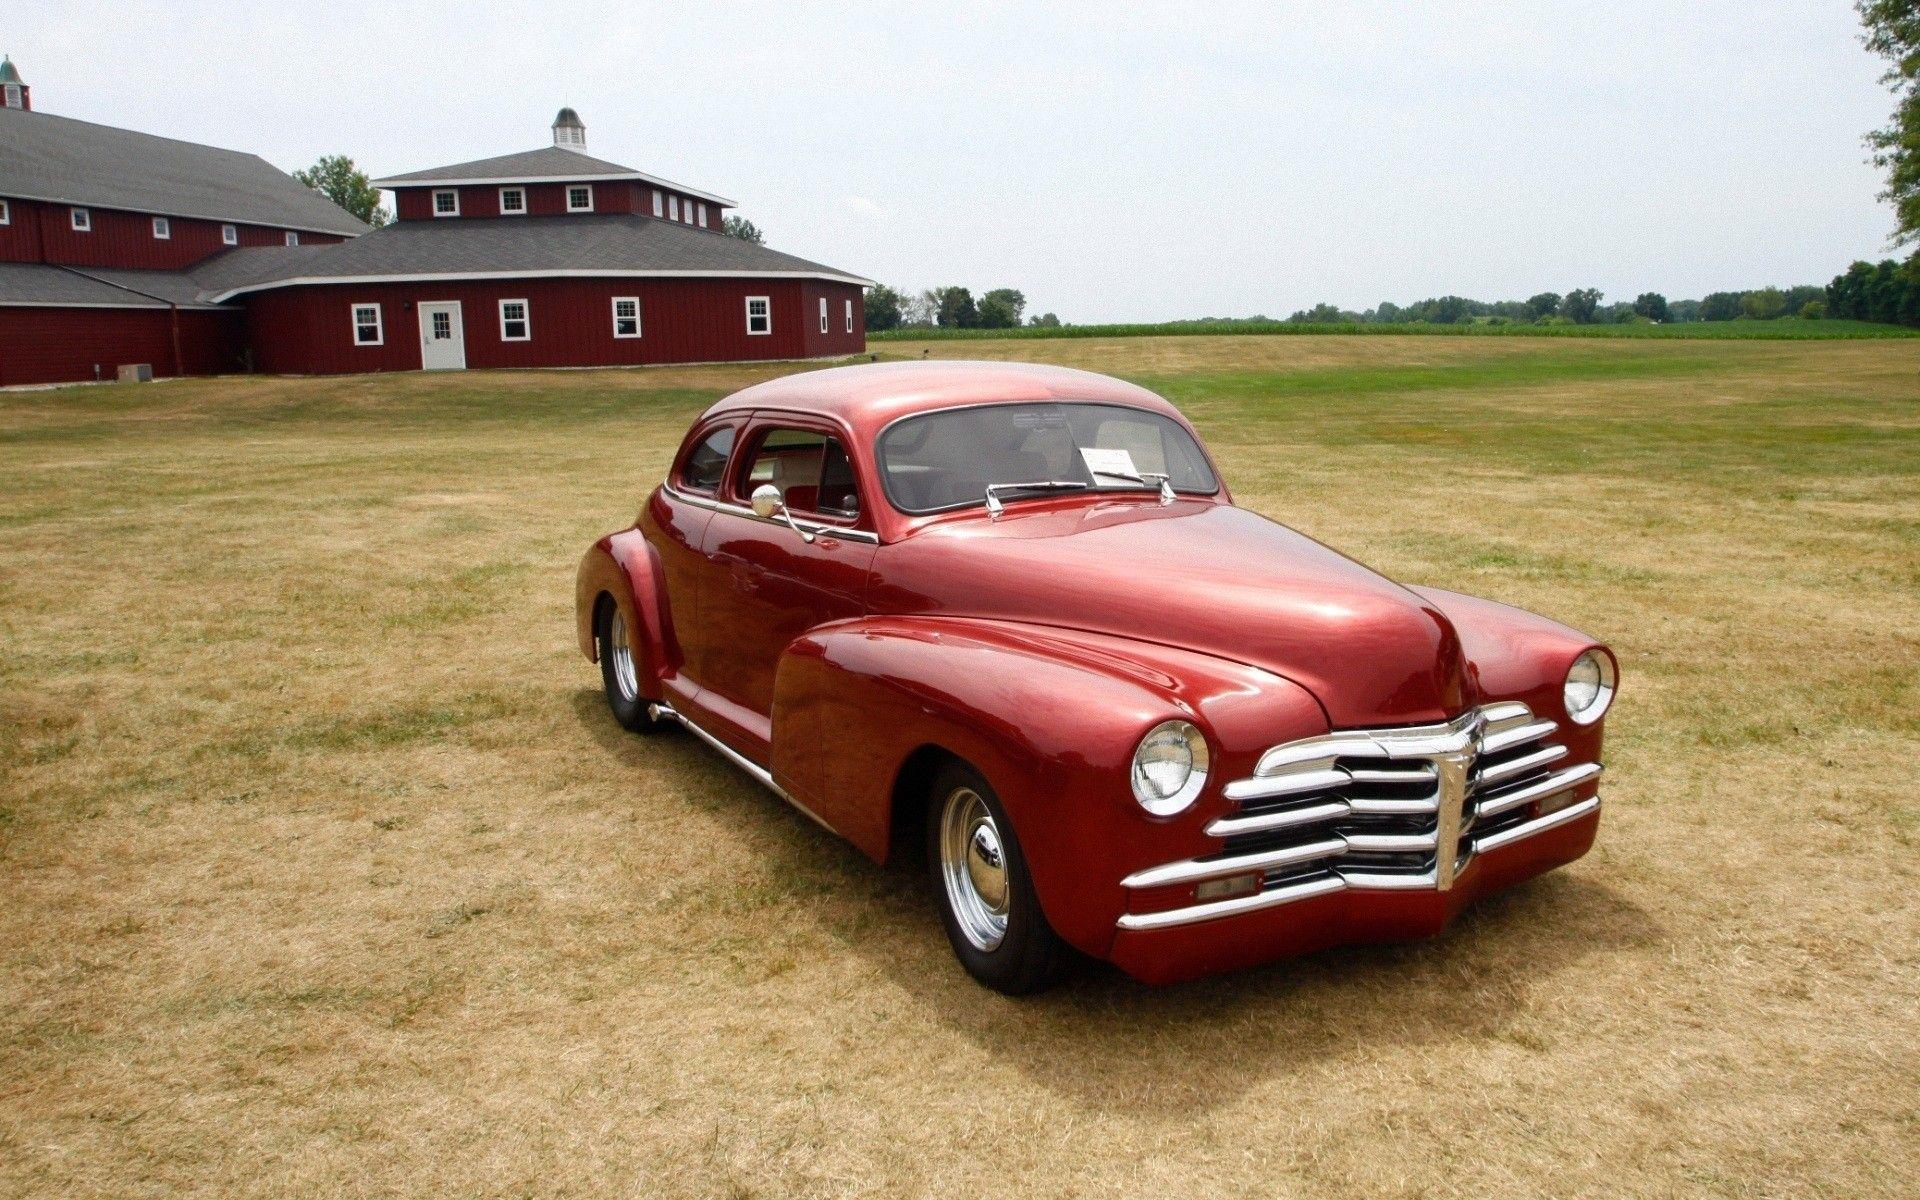 1948 dodge sedan alpha coders abyss vehicles hot rod 1948 dodge sedan alpha coders abyss vehicles hot rod 304391